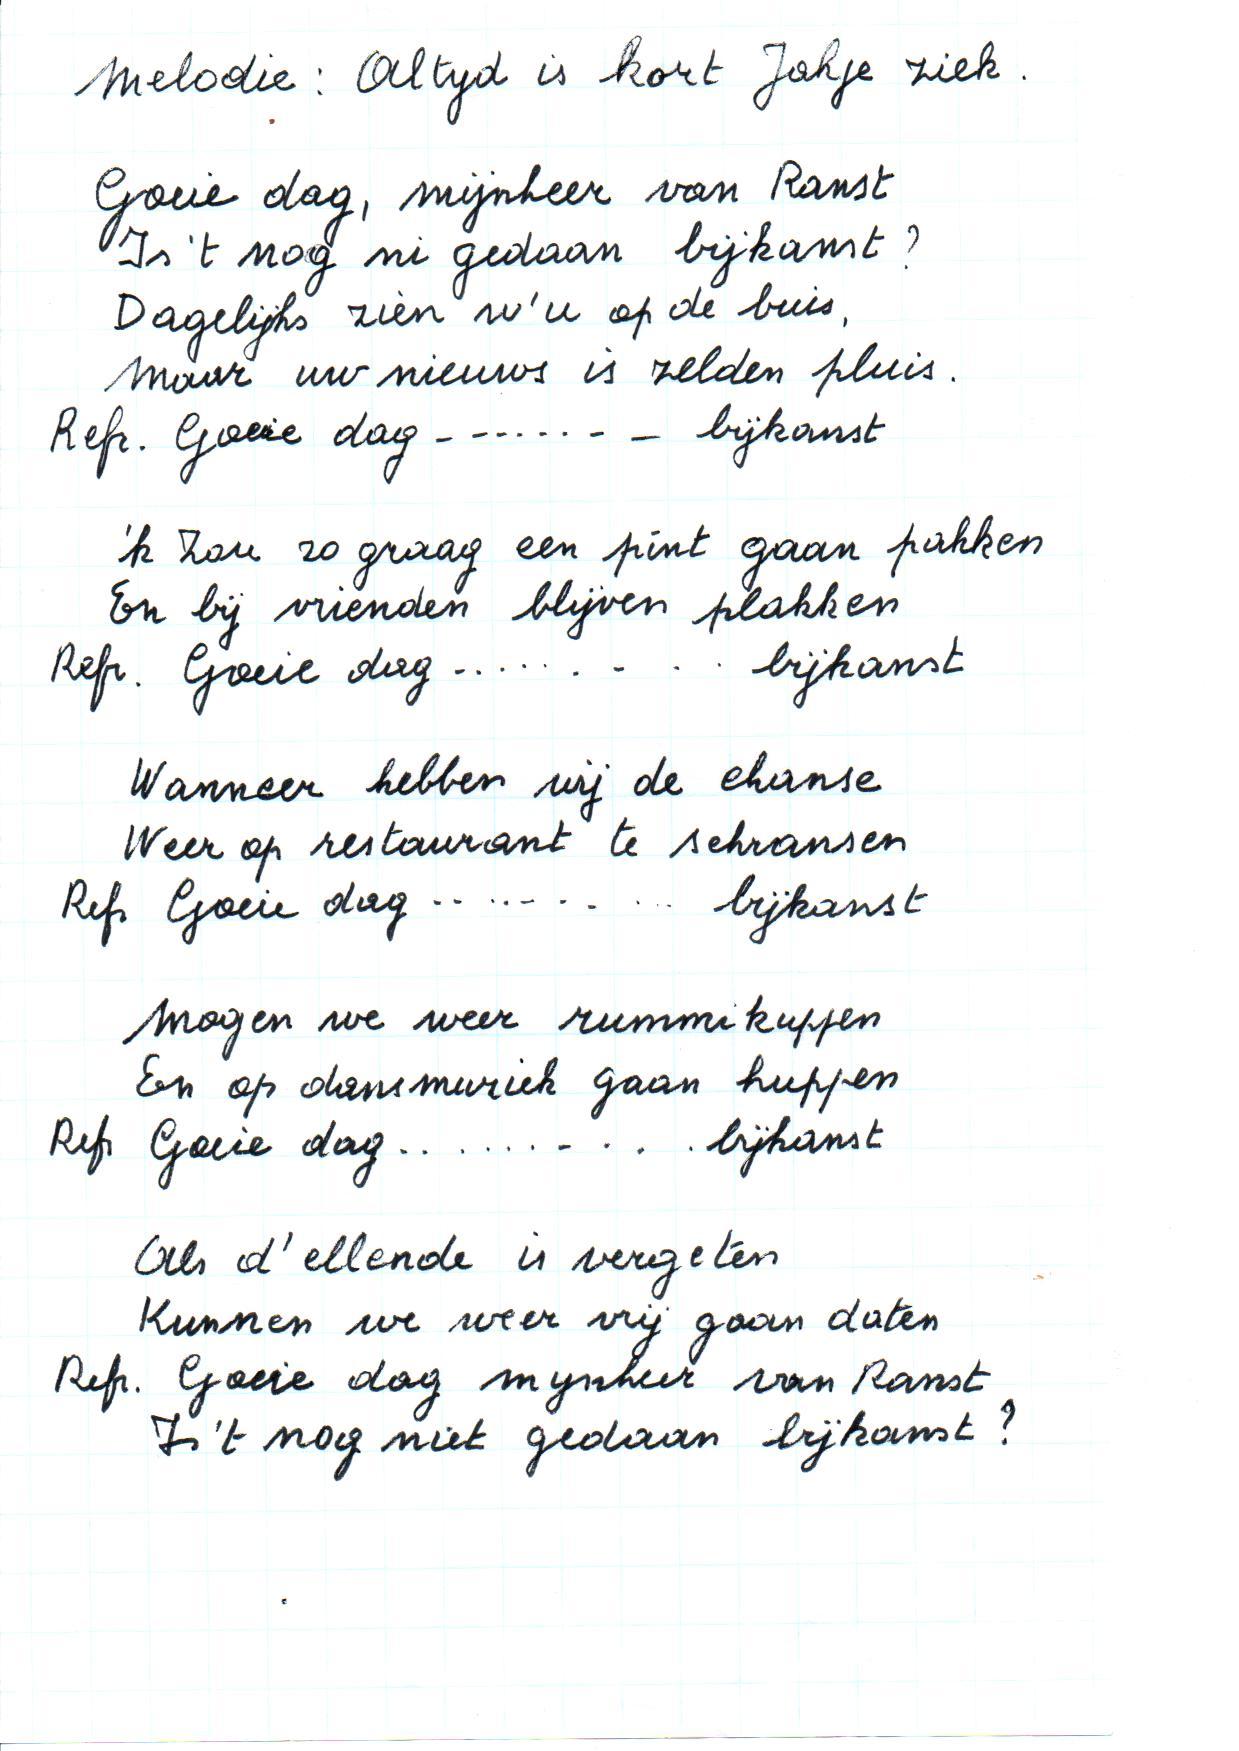 Gusta Maes, liedtekst 'Goeiedag mijnheer Van Ranst', FelixArchief, inv.nr 2903#2.